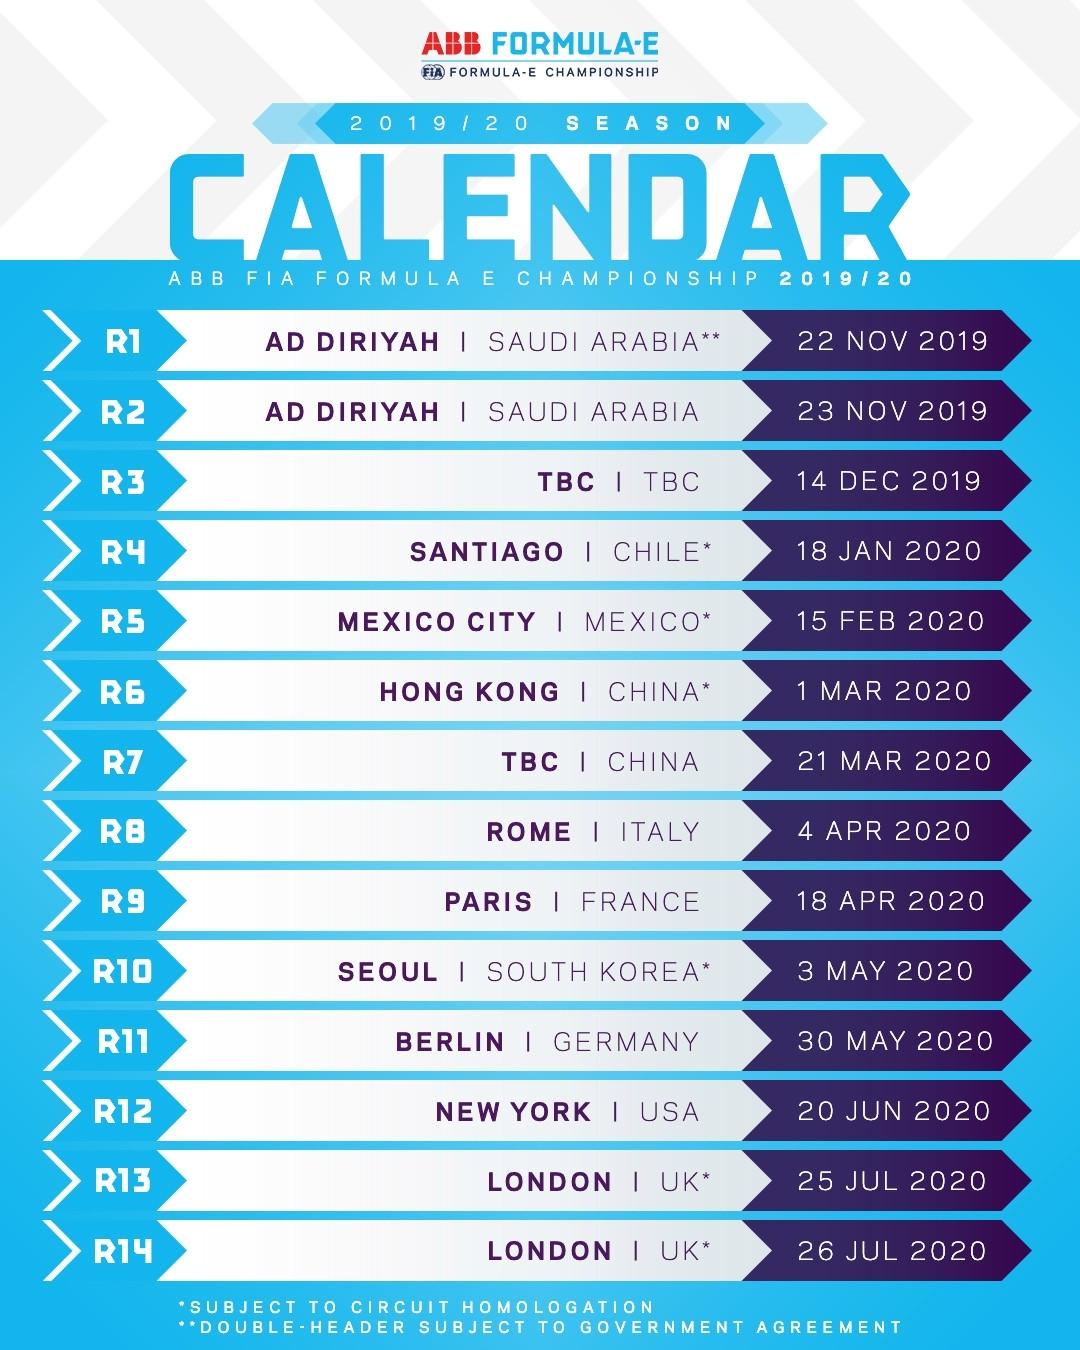 Formula E: Calendar Released For 2019-2020 With London Double-Header throughout Formula E 2019 - 2020 Calendar